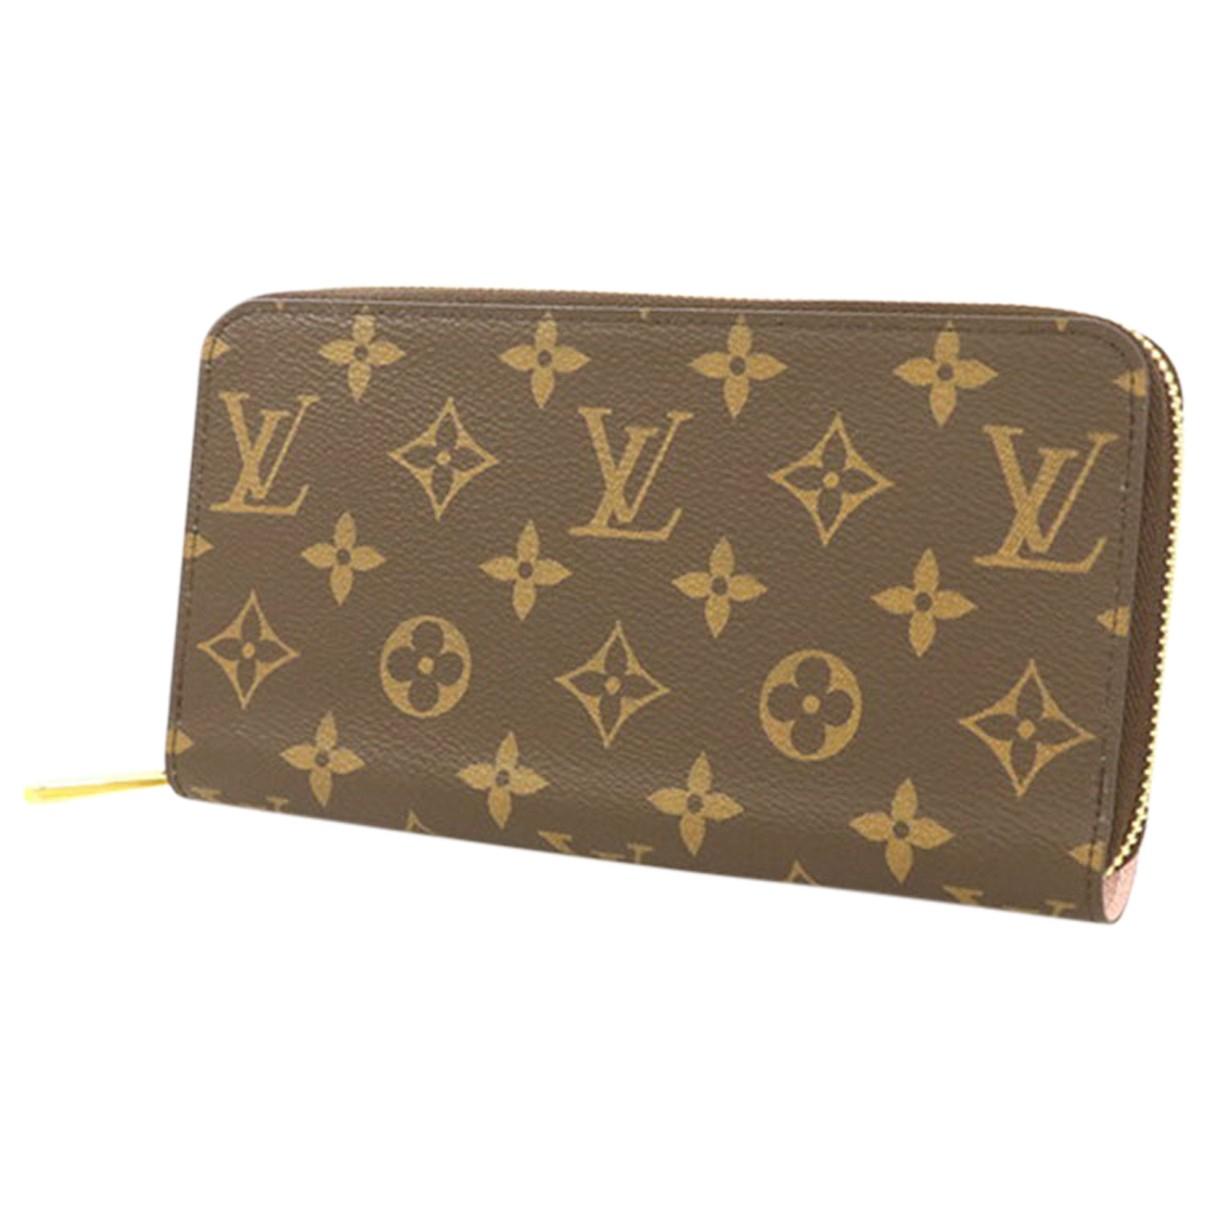 Louis Vuitton N Leather wallet for Women N